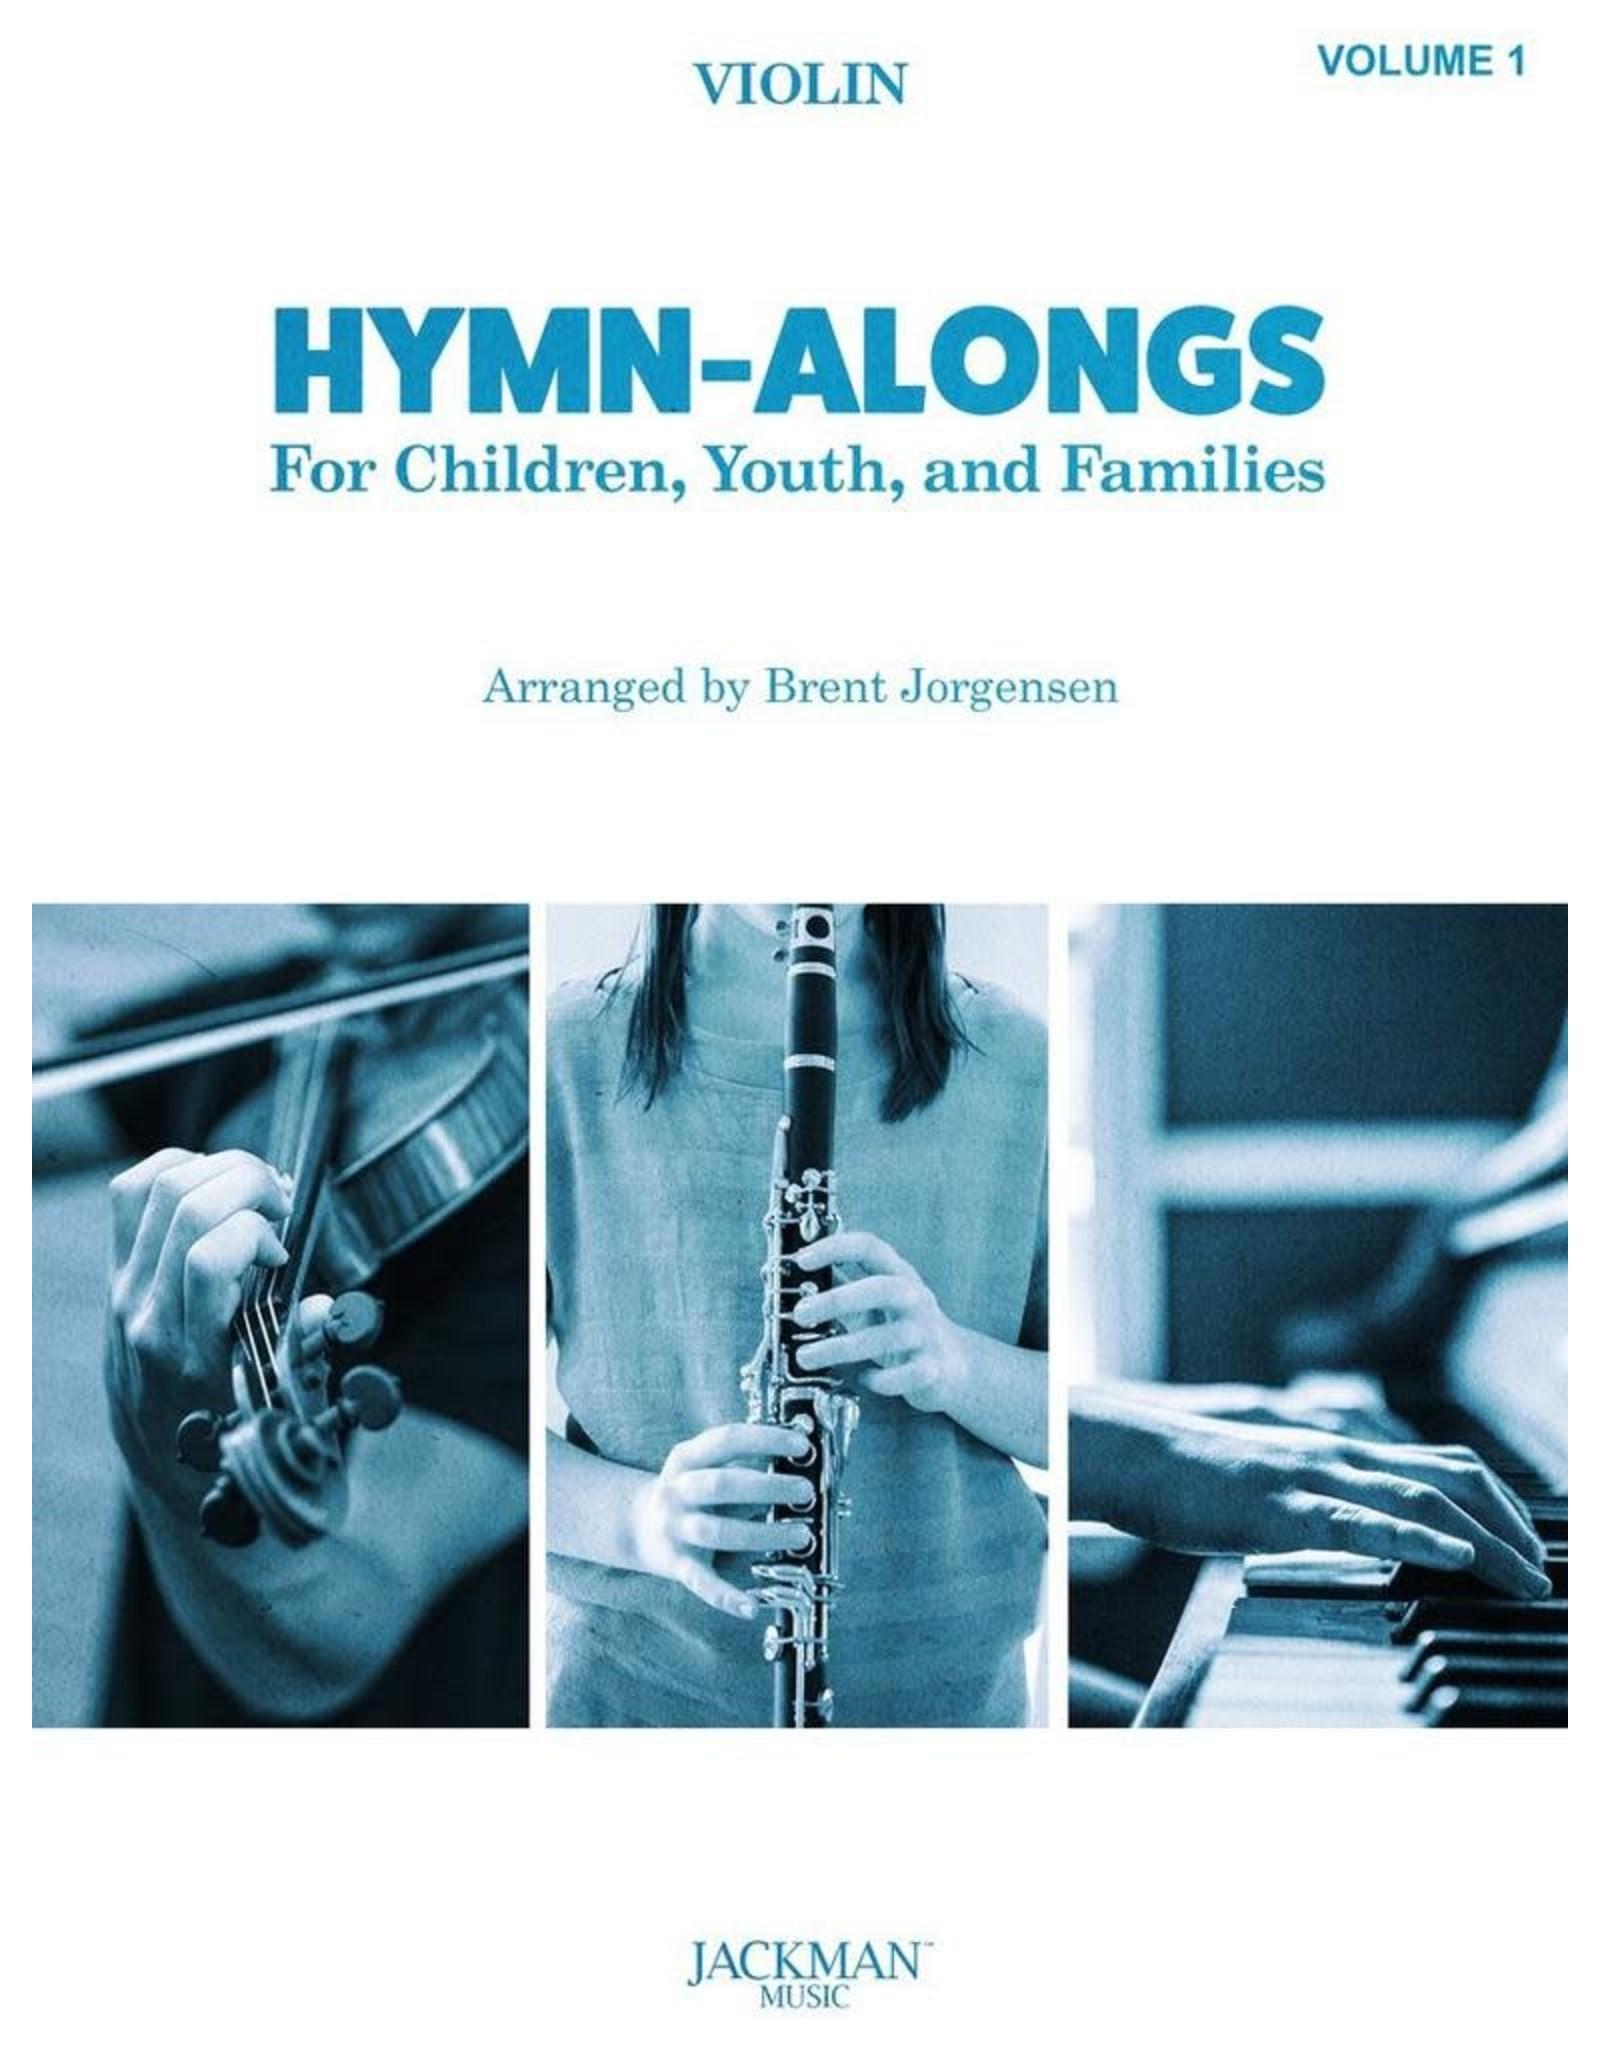 Jackman Music Hymn-Alongs Vol. 1 - arr. Brent Jorgensen - Violin